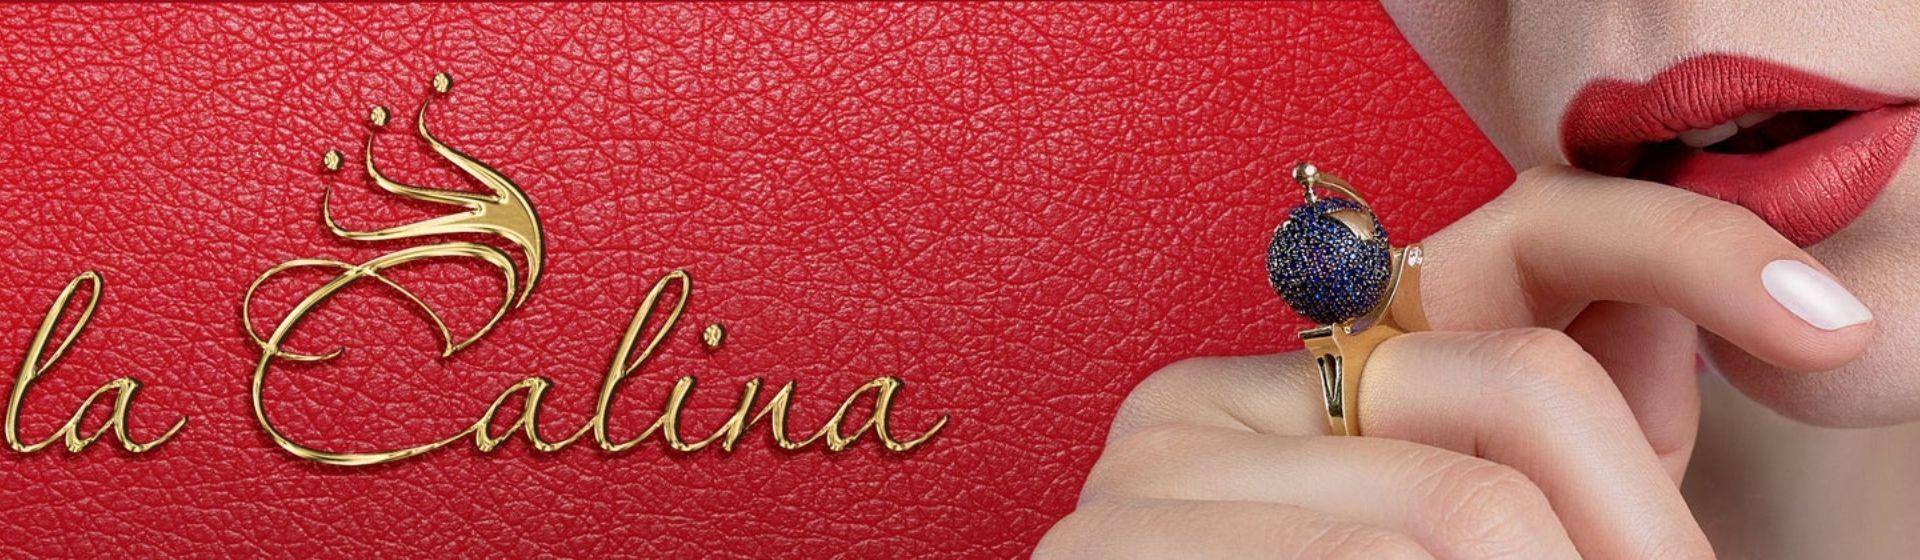 La Calina Jewellery